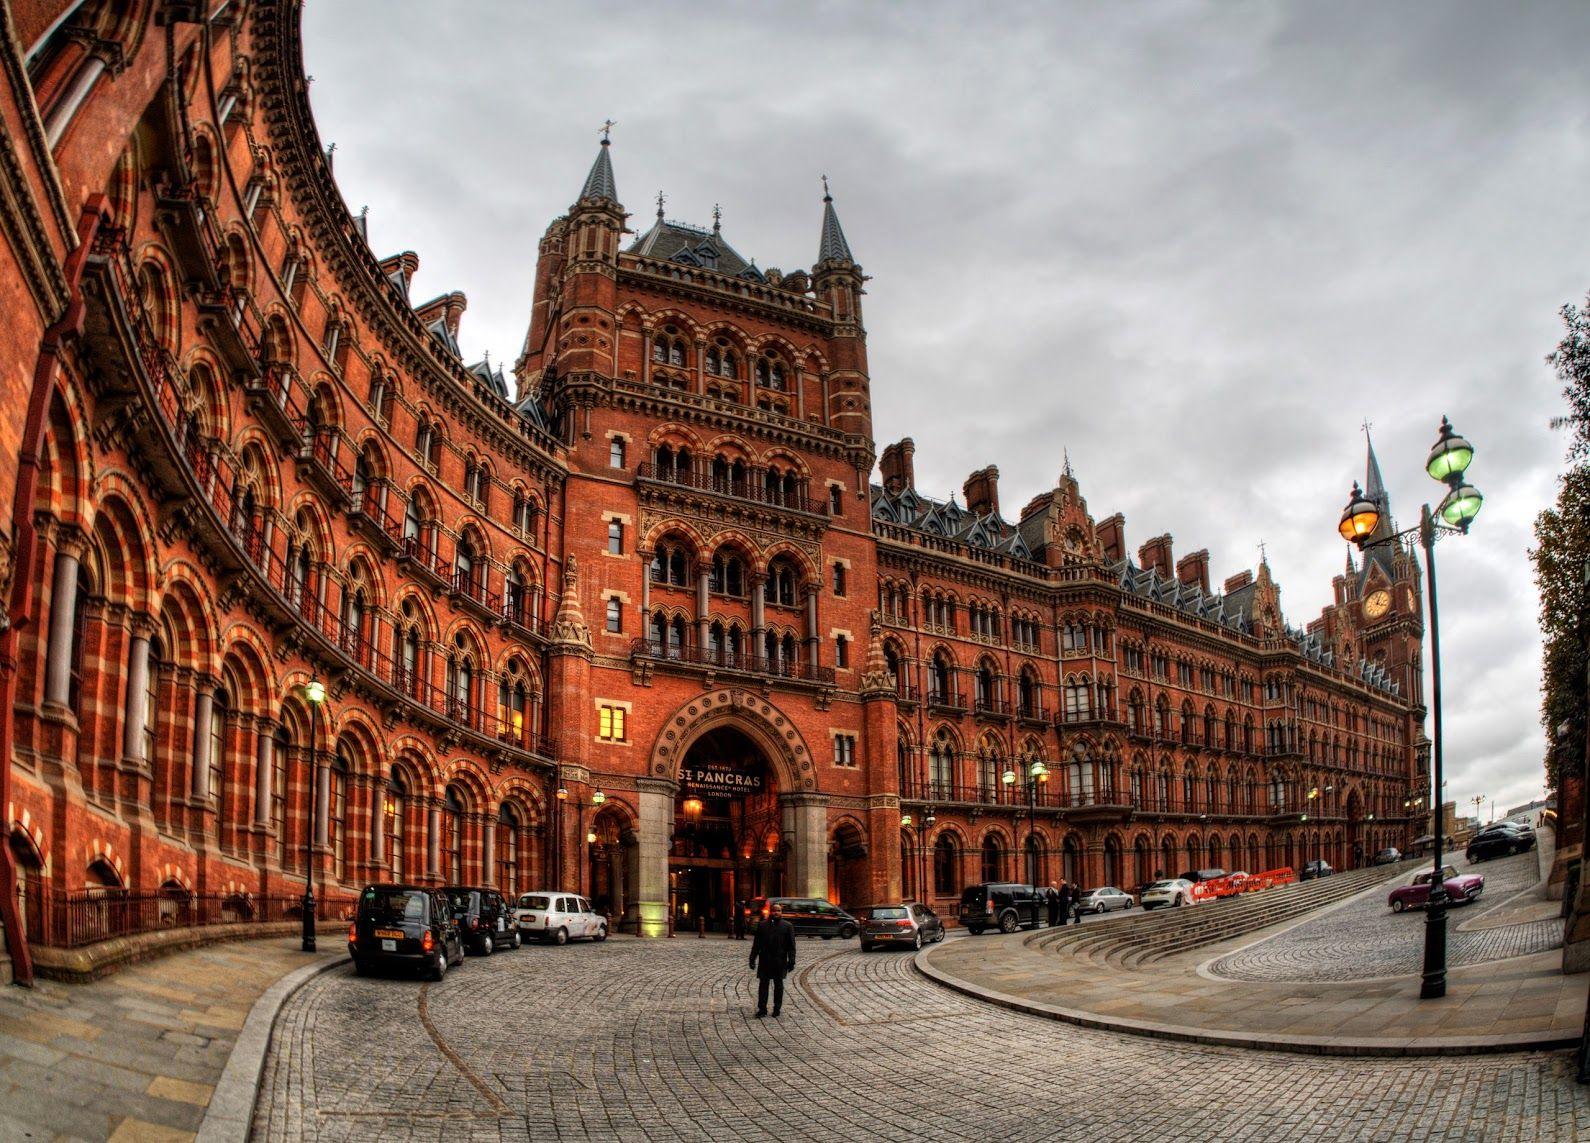 St. Pancras Station, London, by Neil Howard